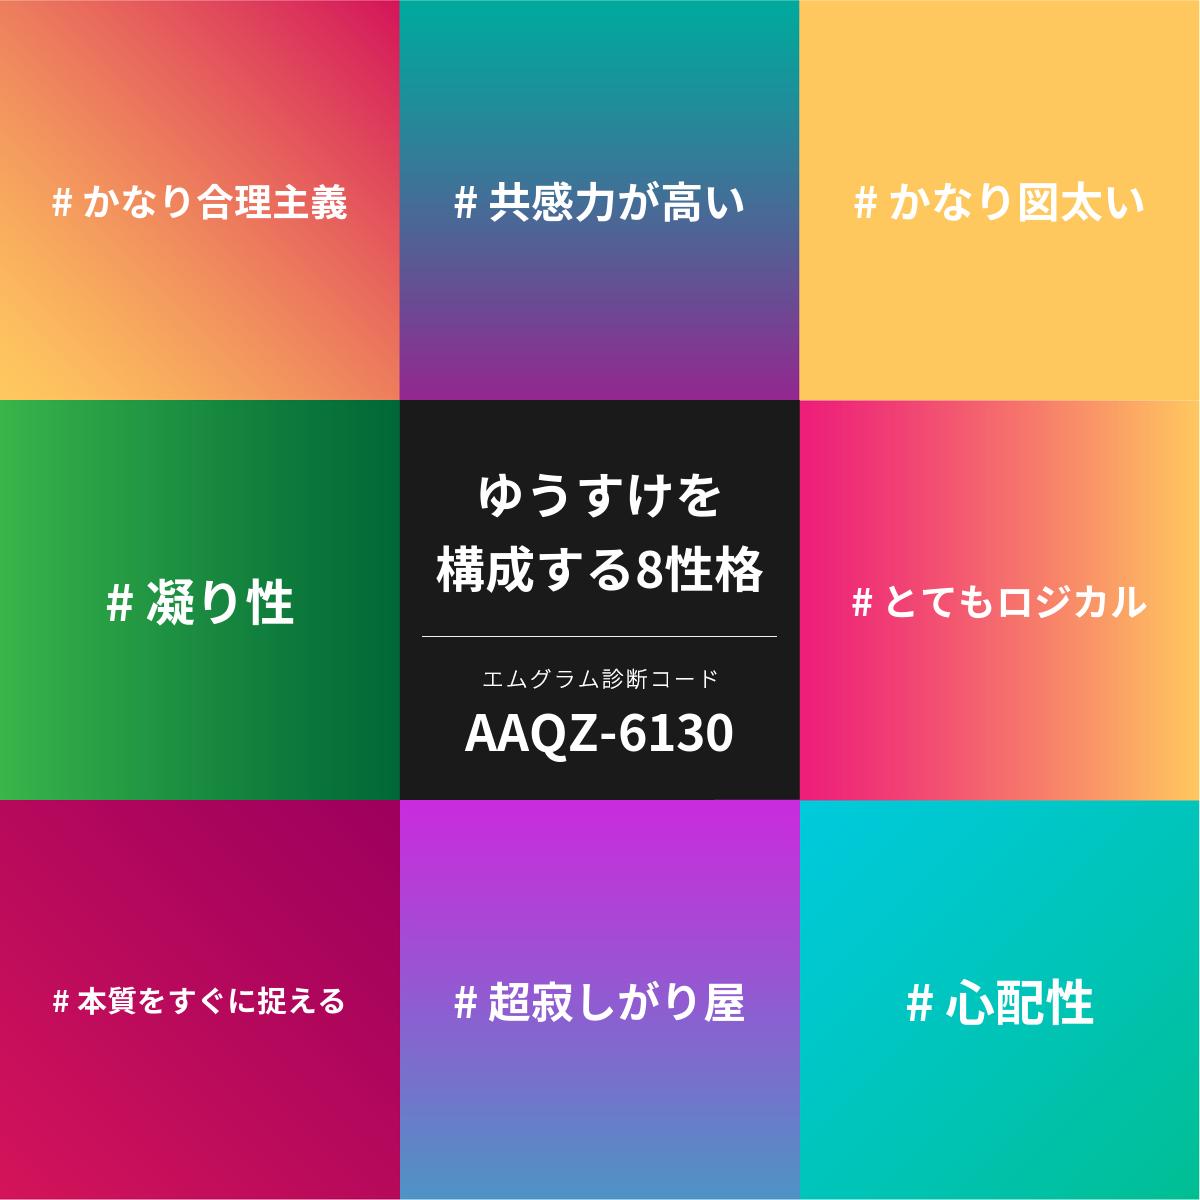 f:id:yusuke38:20191130170136p:plain